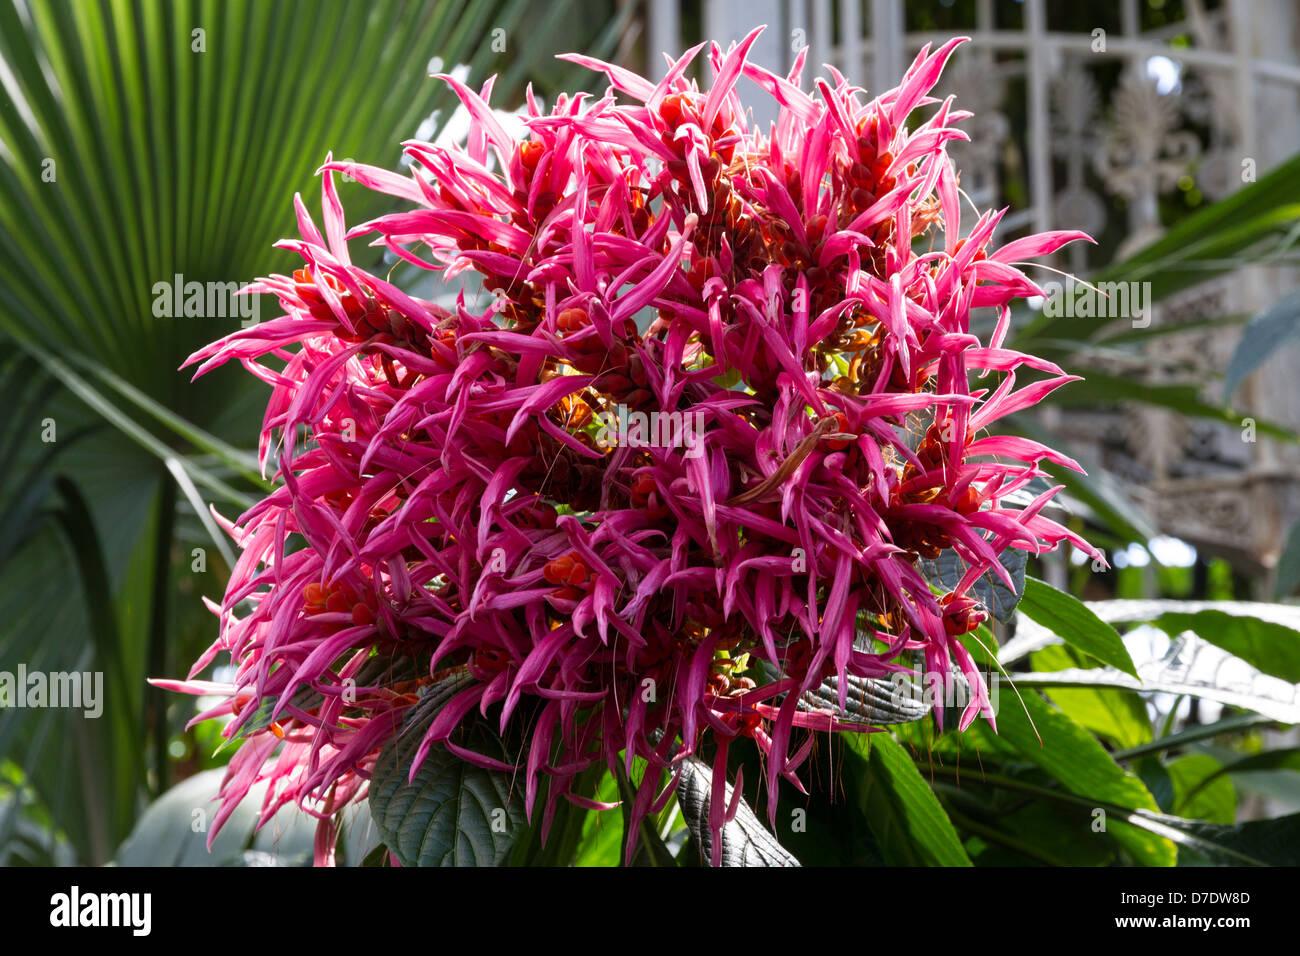 Coral Aphelandra plant Stock Photo, Royalty Free Image ...